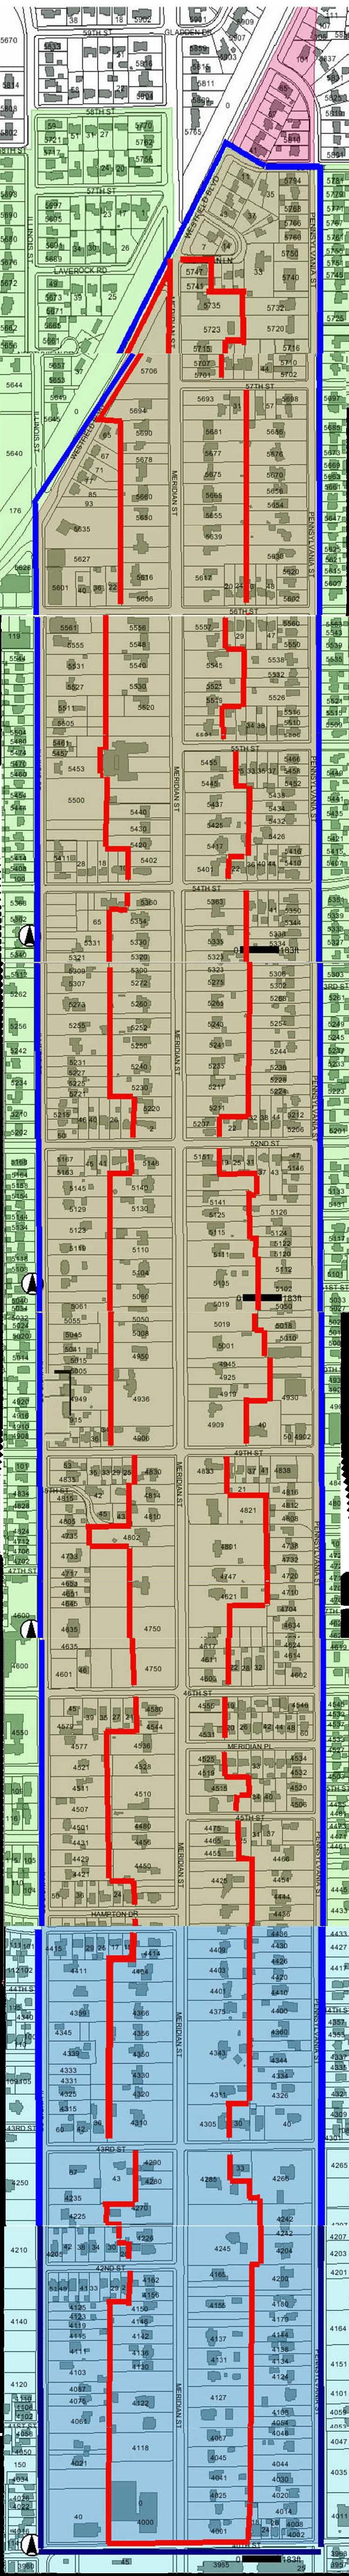 Meridian Street Foundation Area Map